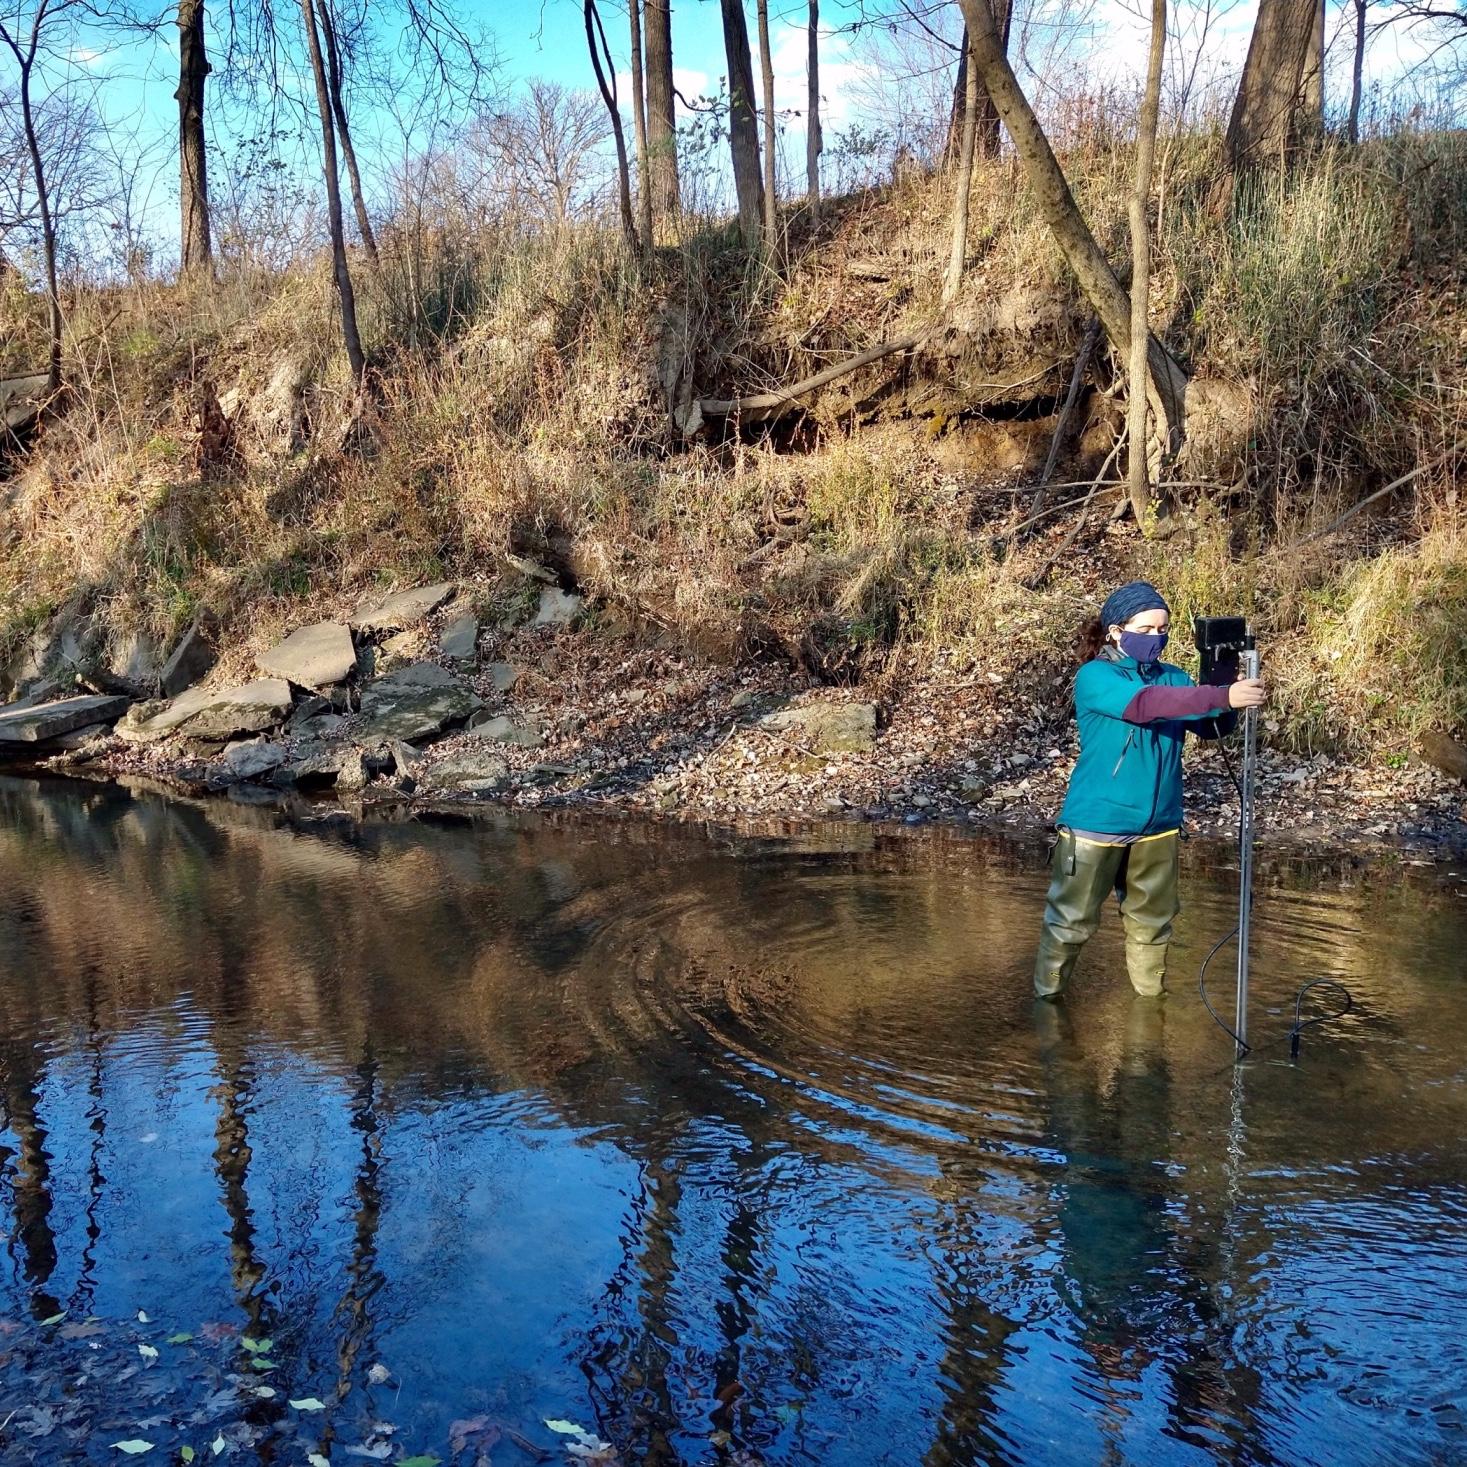 Margaret Golden setting up equipment in a river.